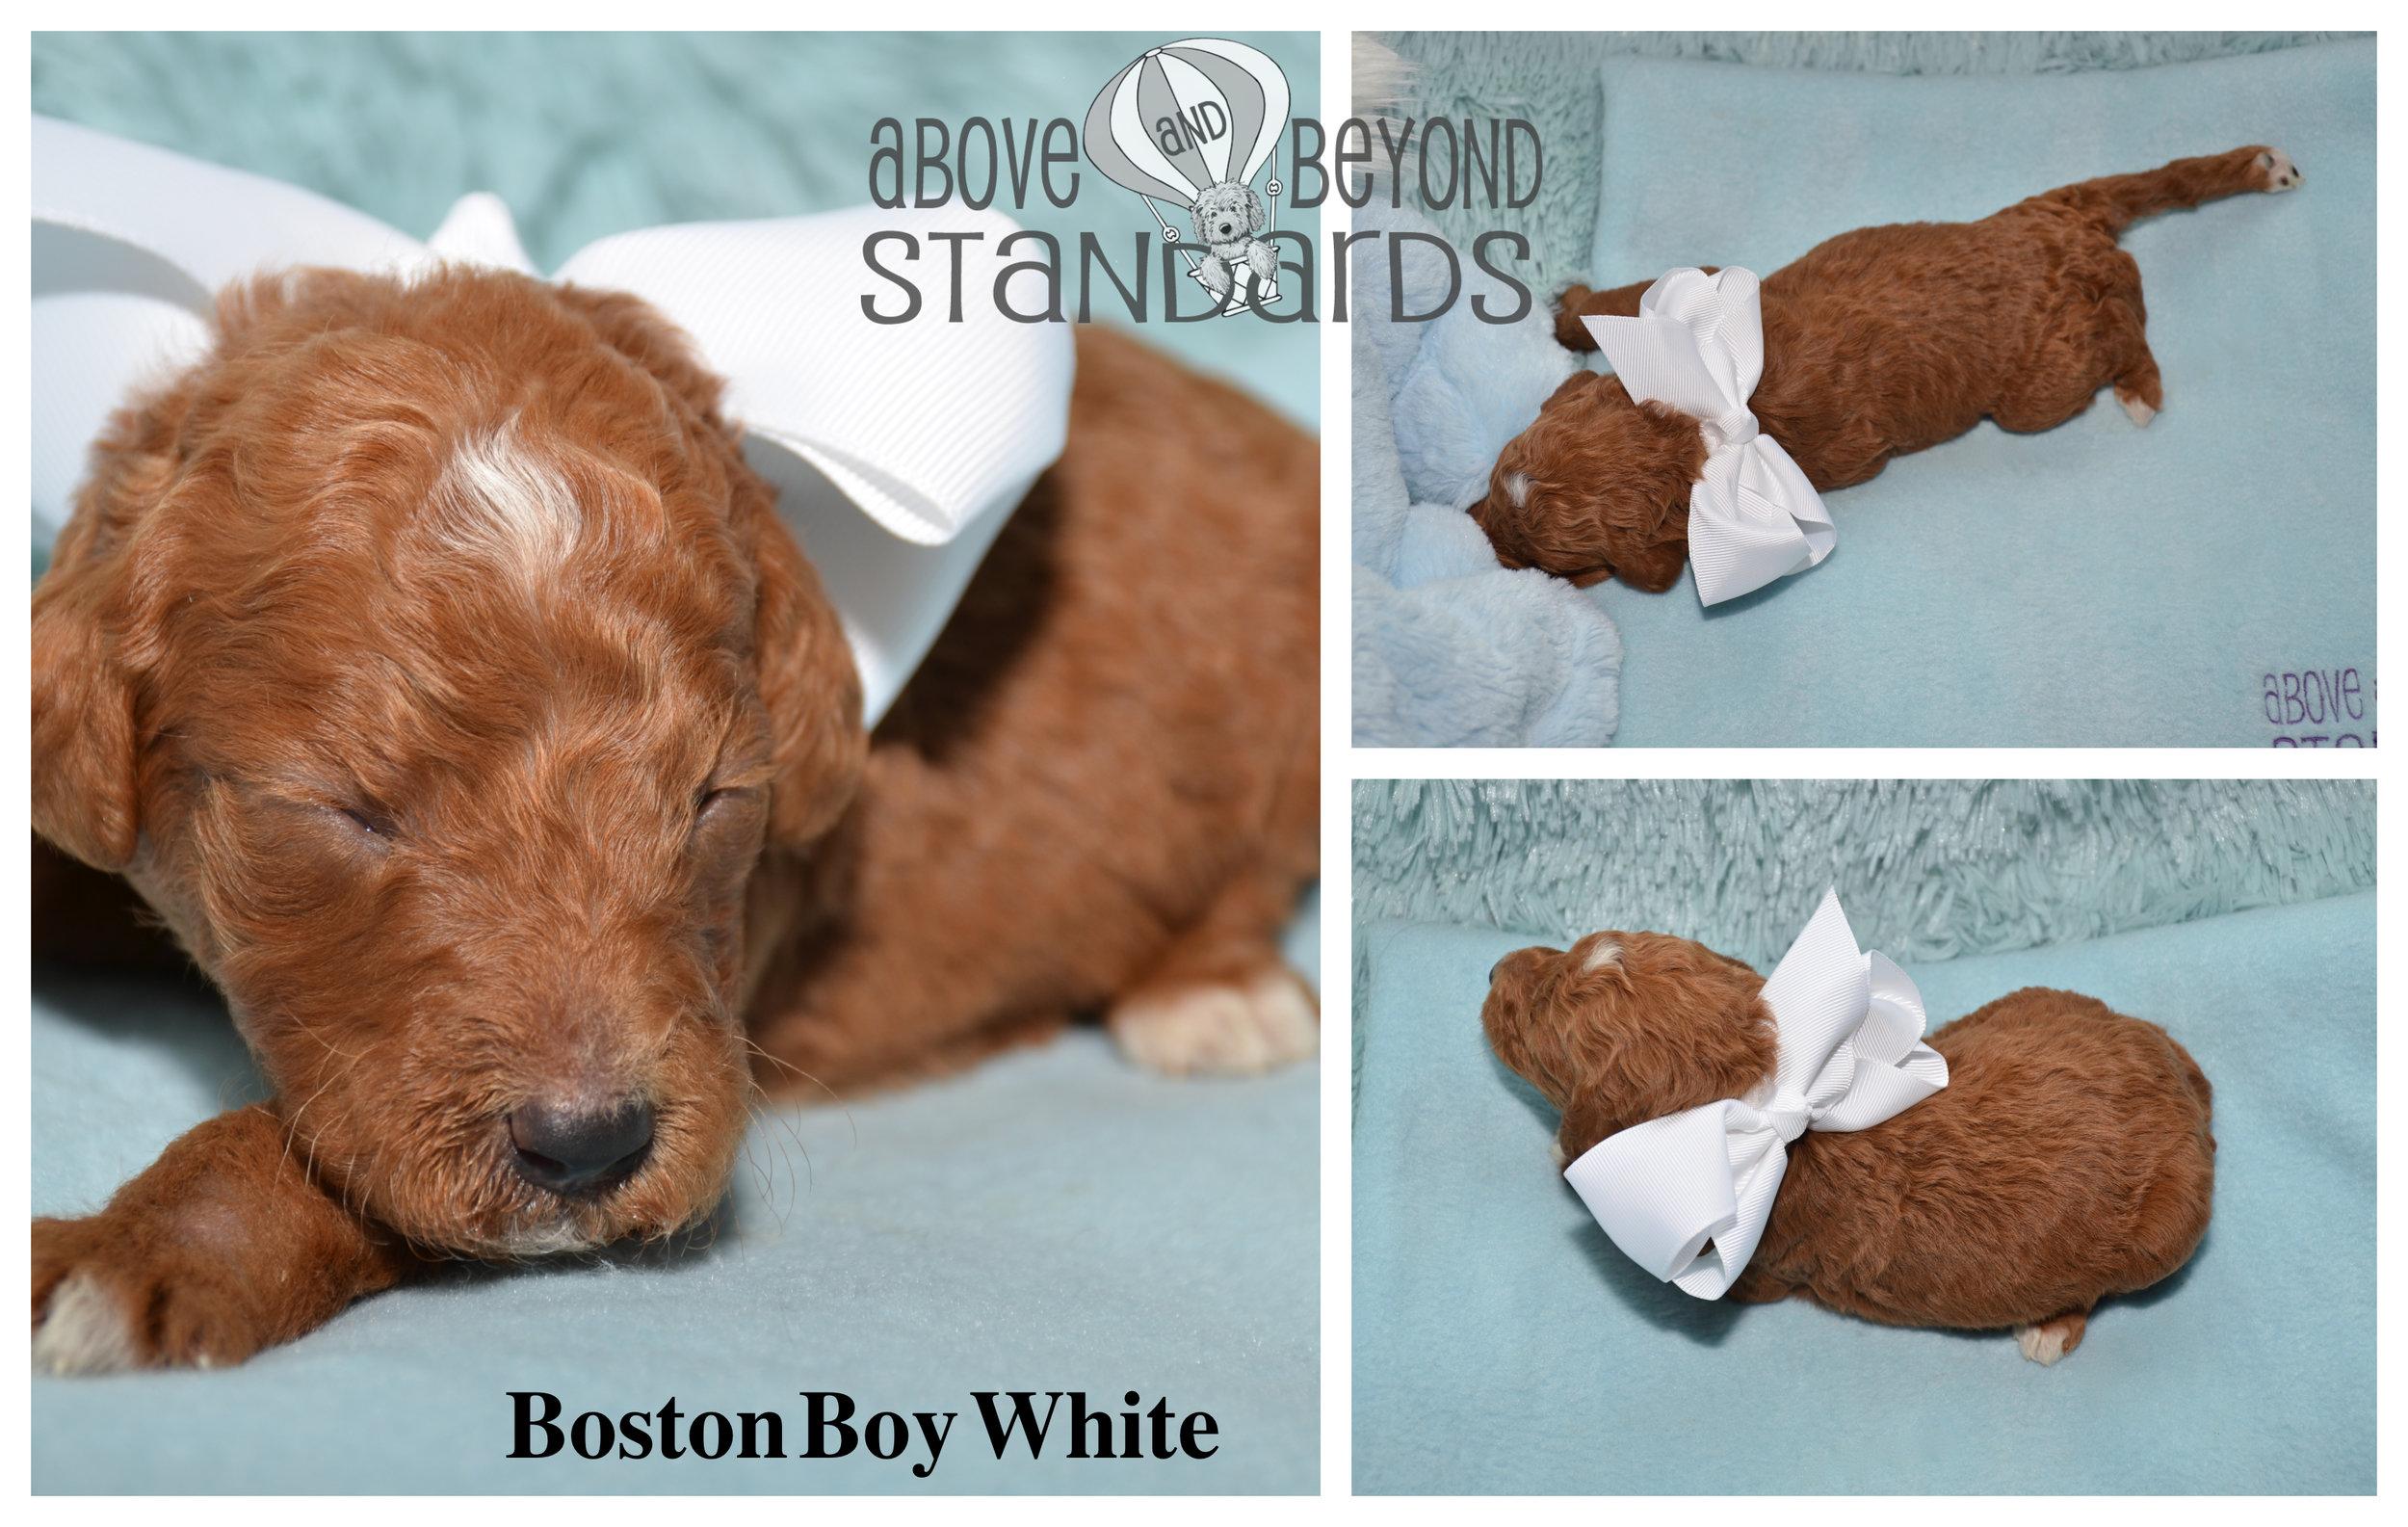 Boston Boy White - EMILIE & CRUSHER STANDARD POODLE FEBRUARY 2ND, 2019.jpg